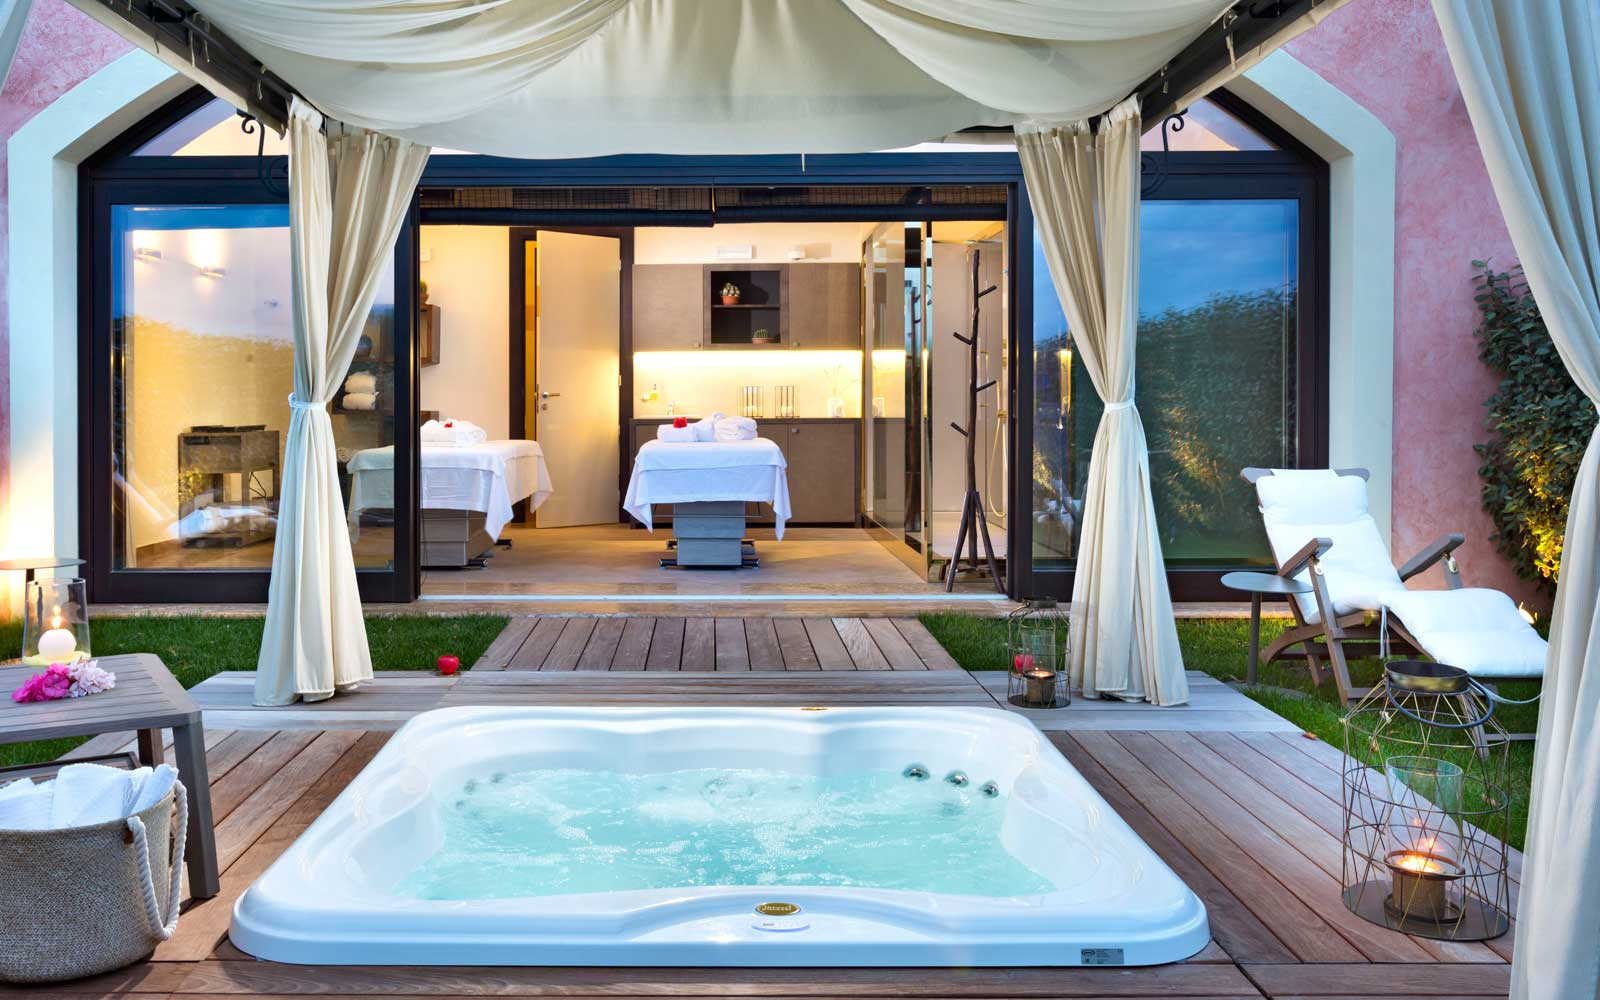 Private Jacuzzi & Spa Area at Hotel Abi D'oru